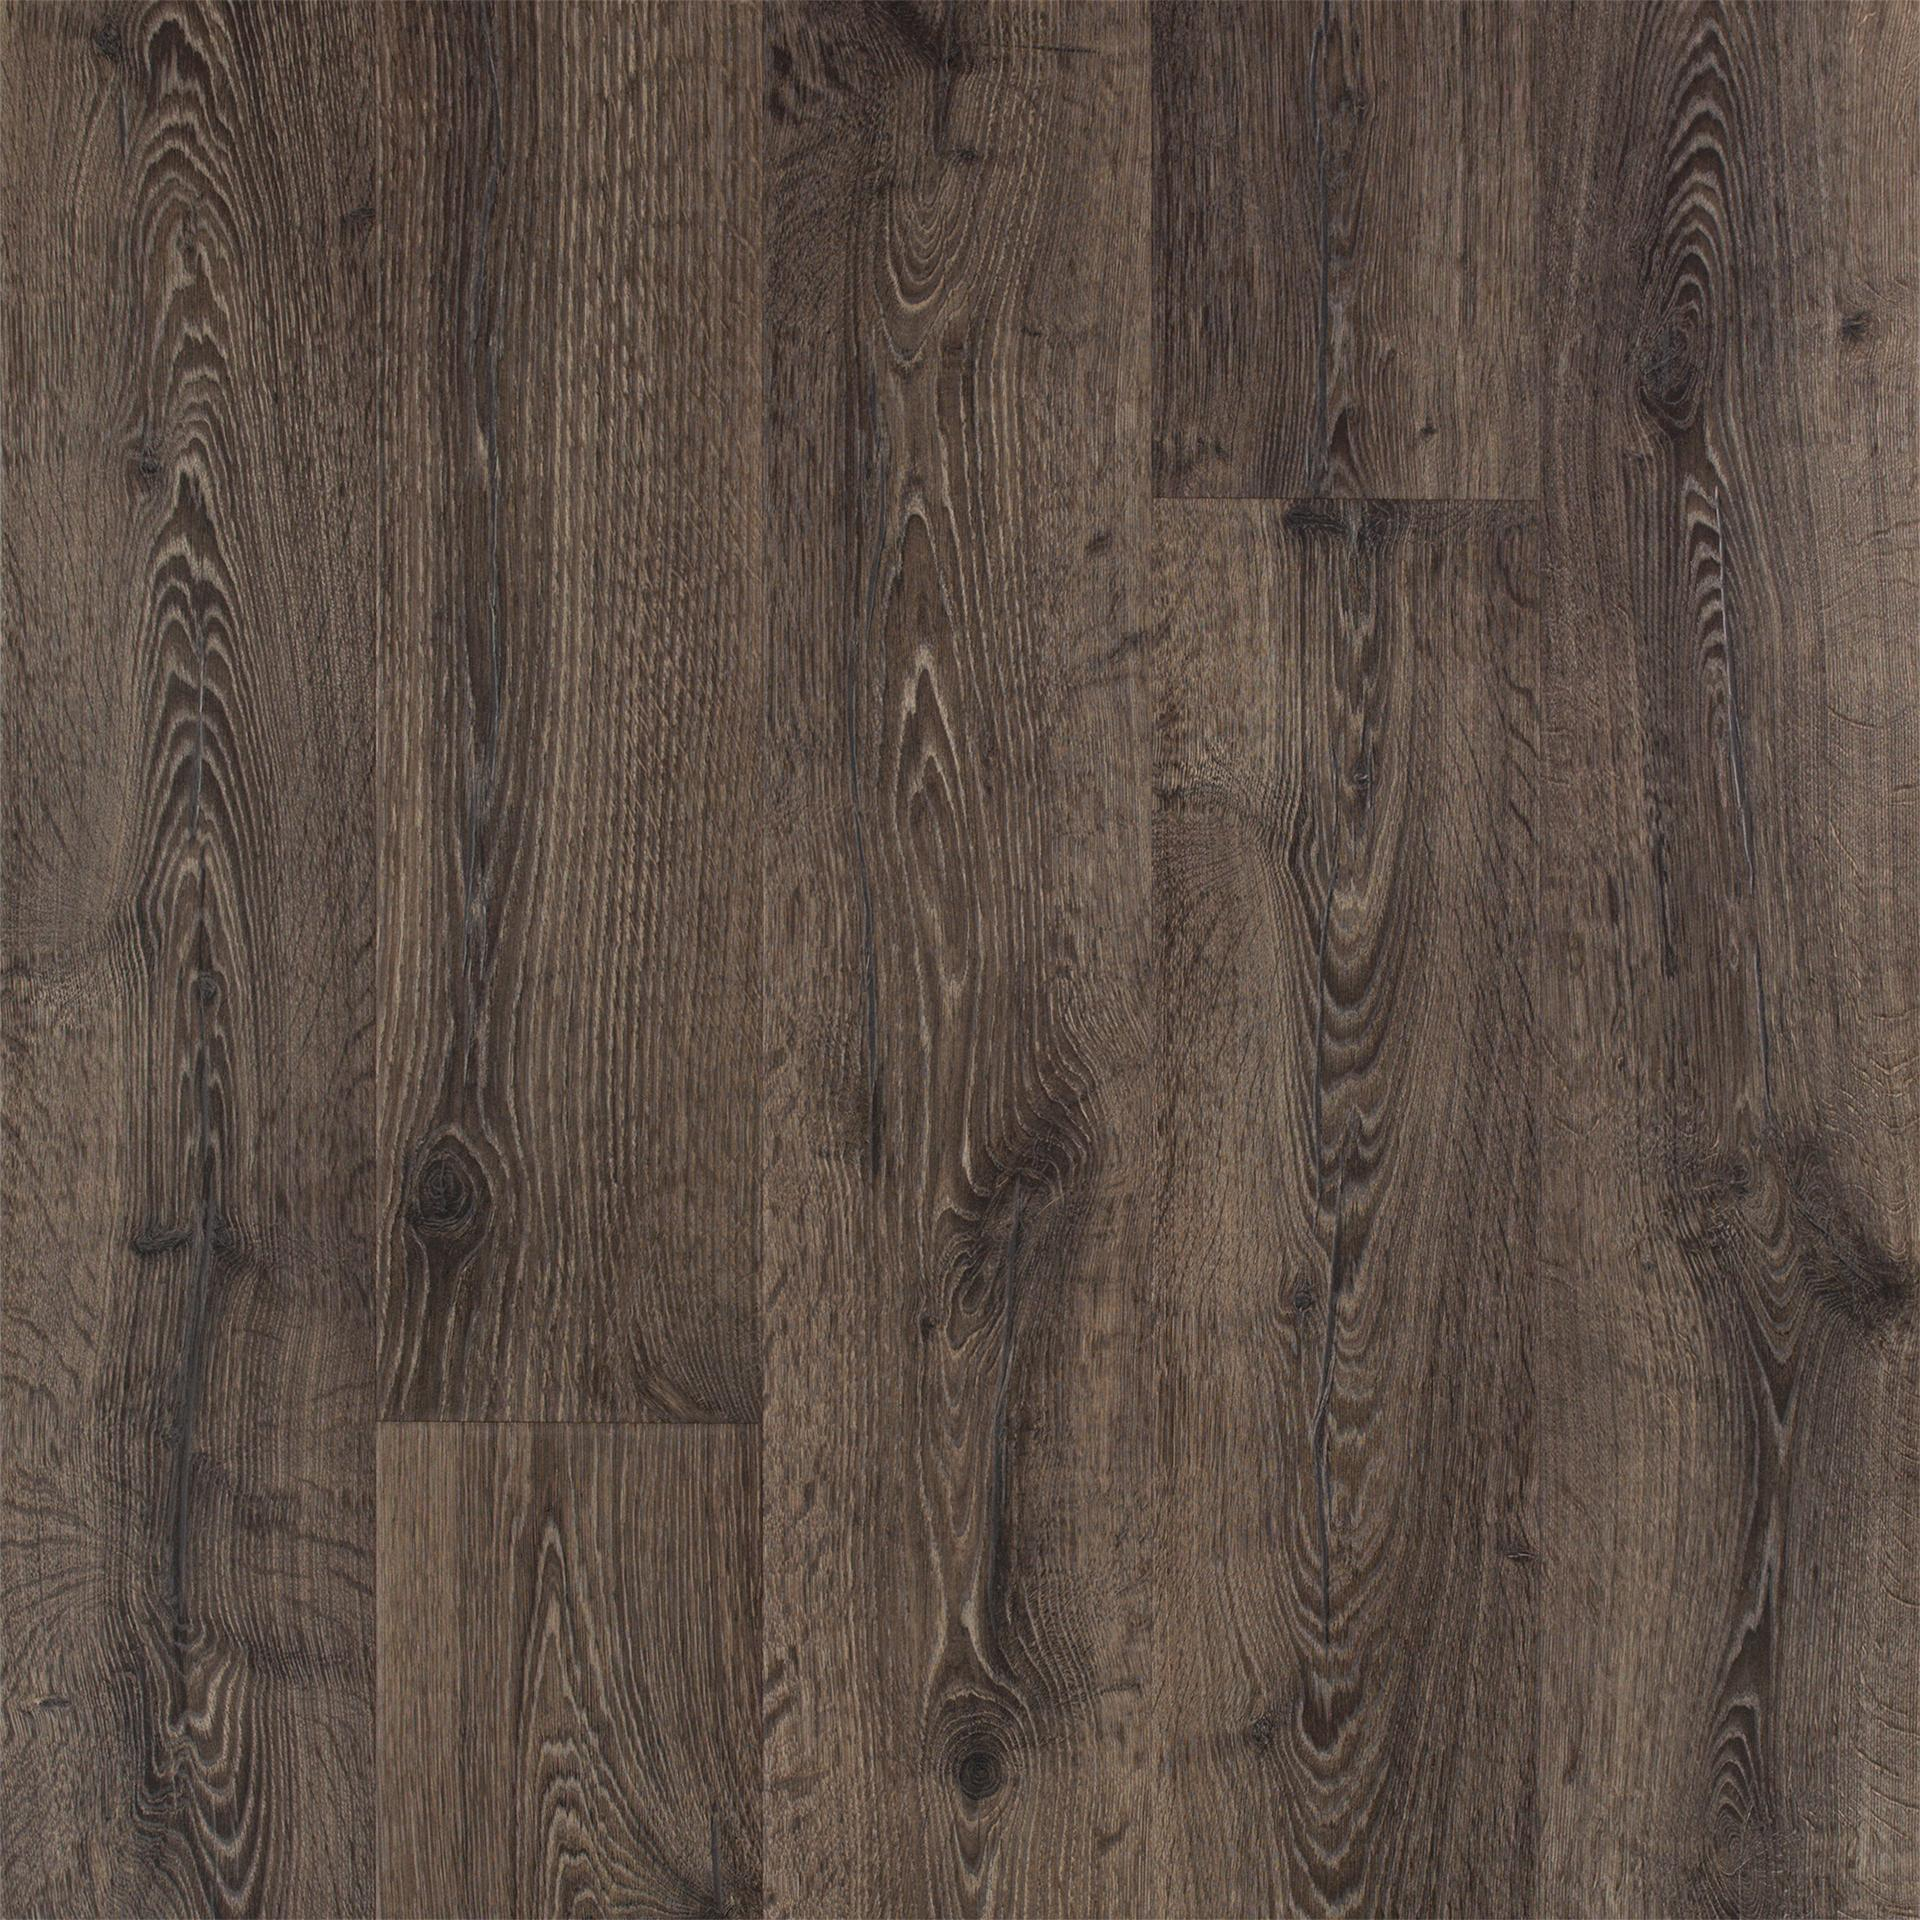 Quickstep Cumberland Oak Buy Laminate Flooring Online